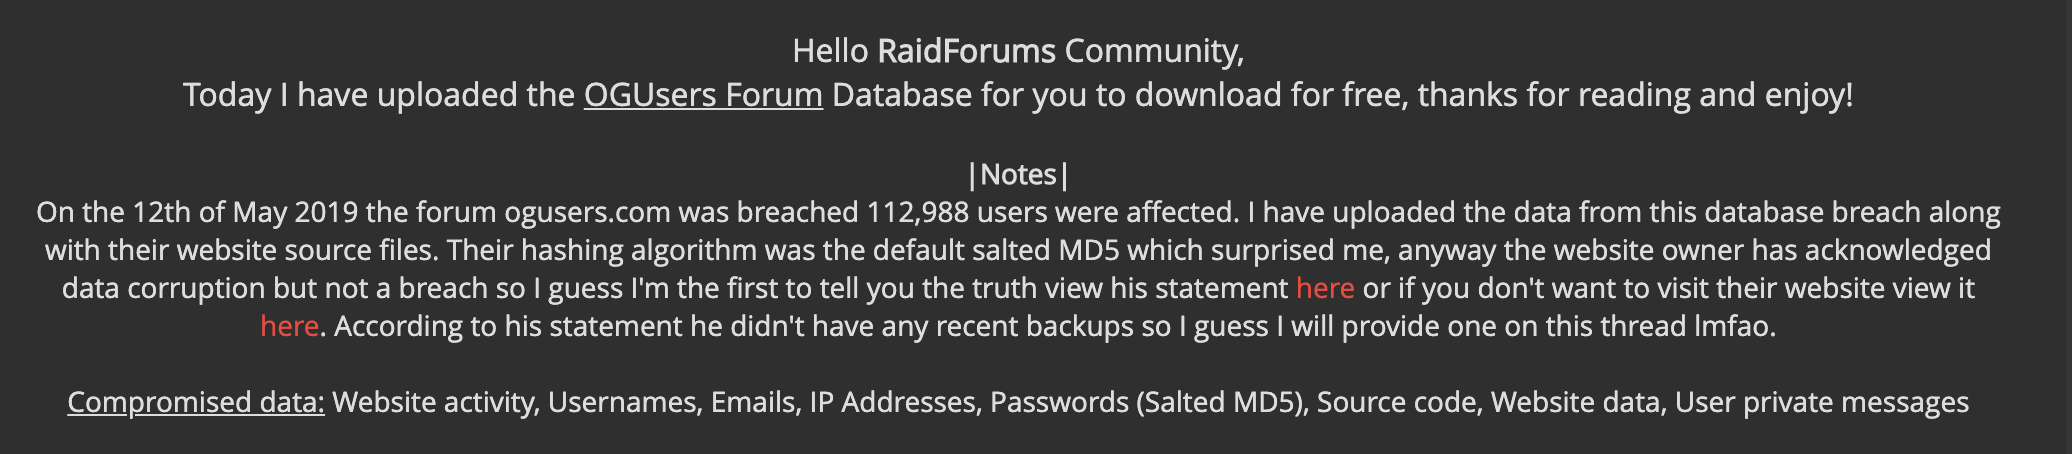 RaidForums